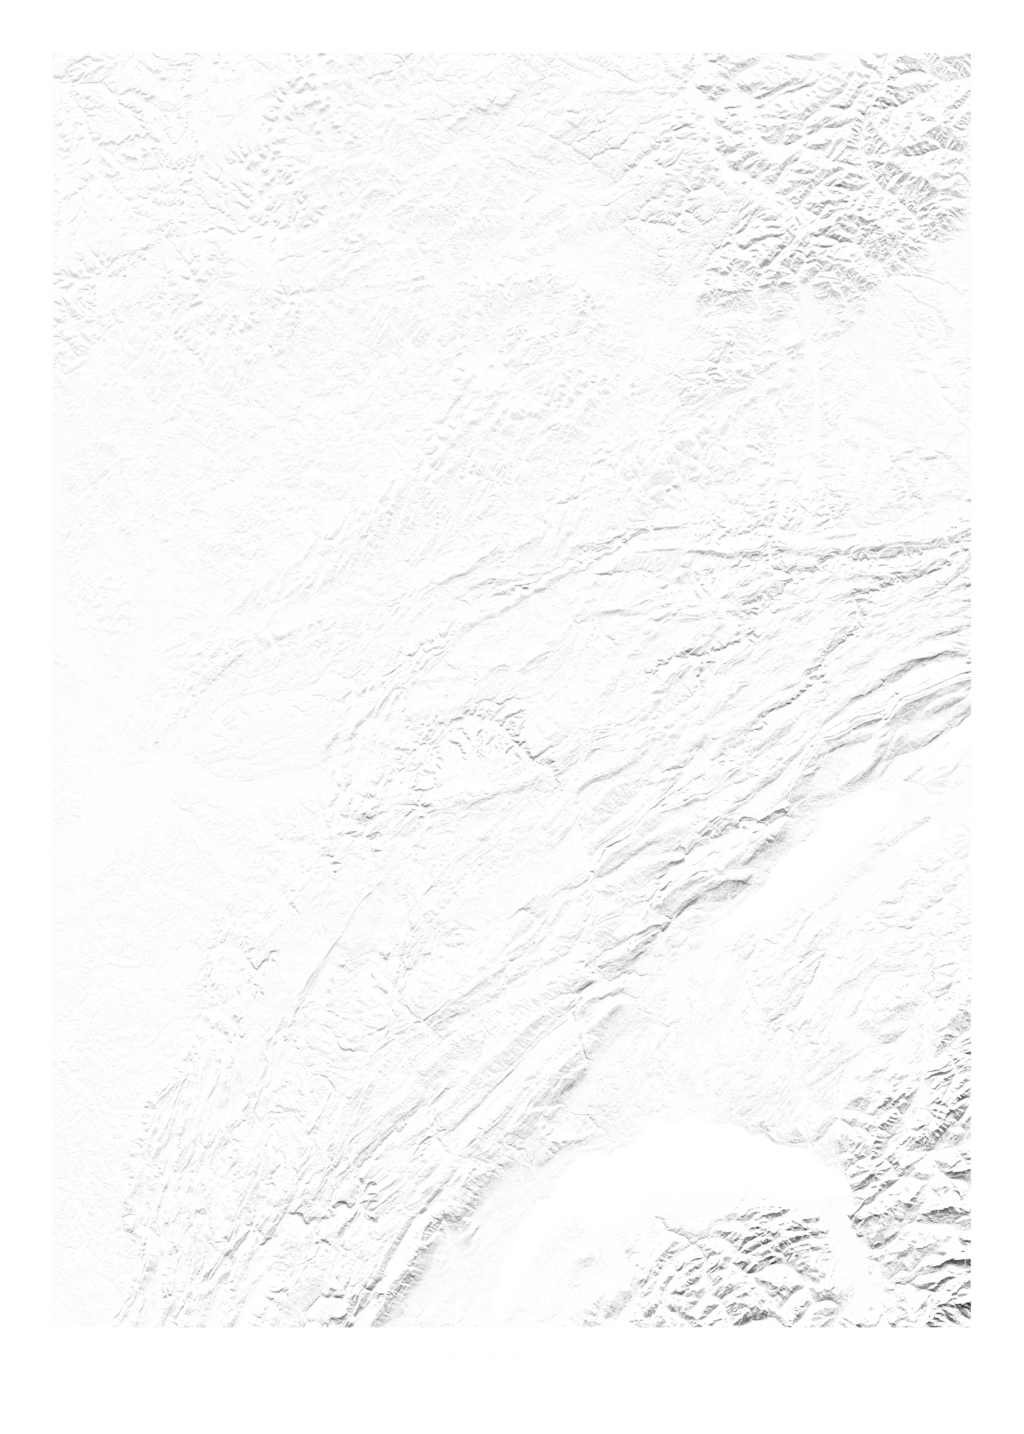 Franche Comte wall map